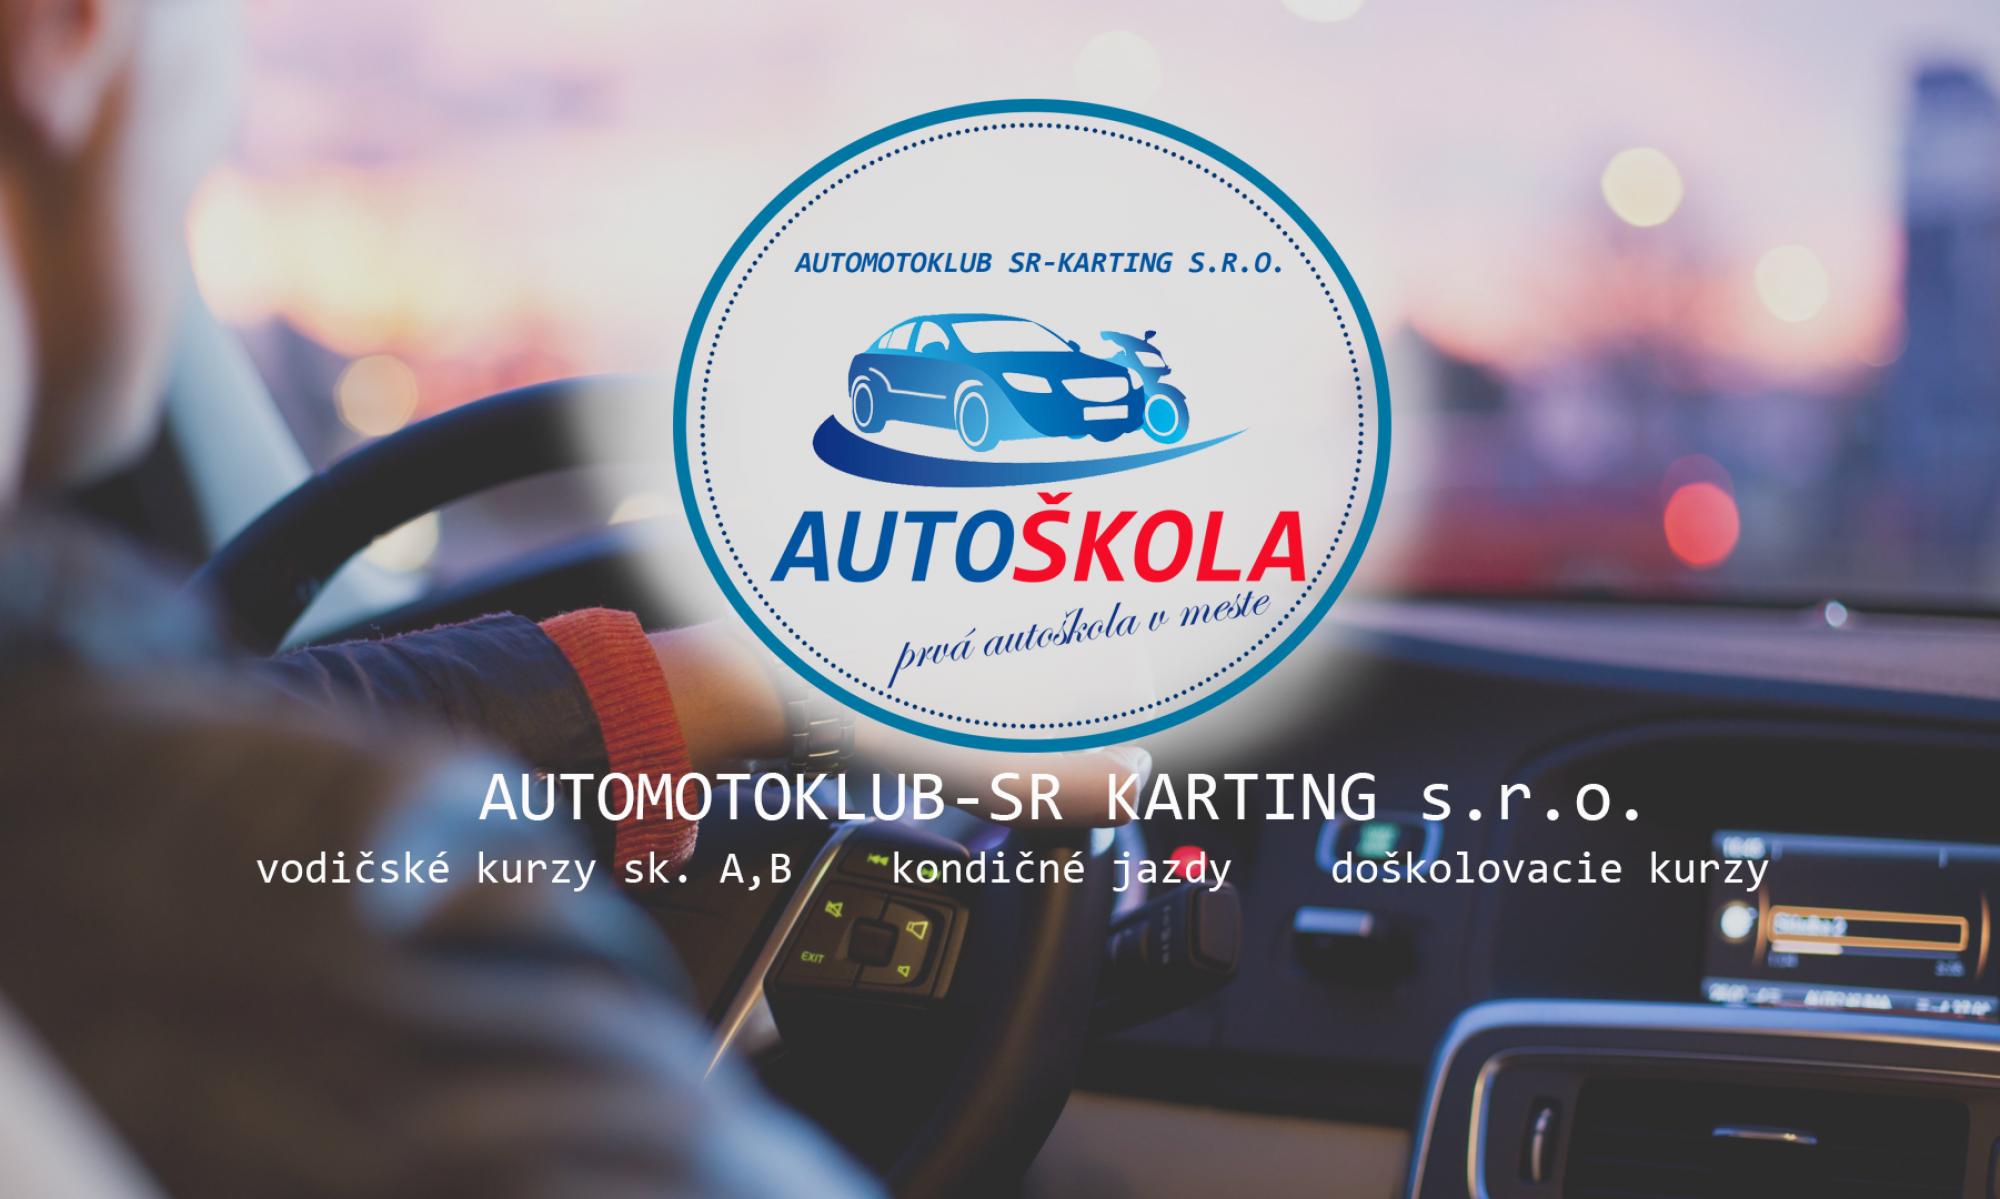 Autoškola AMK-SR karting s.r.o.